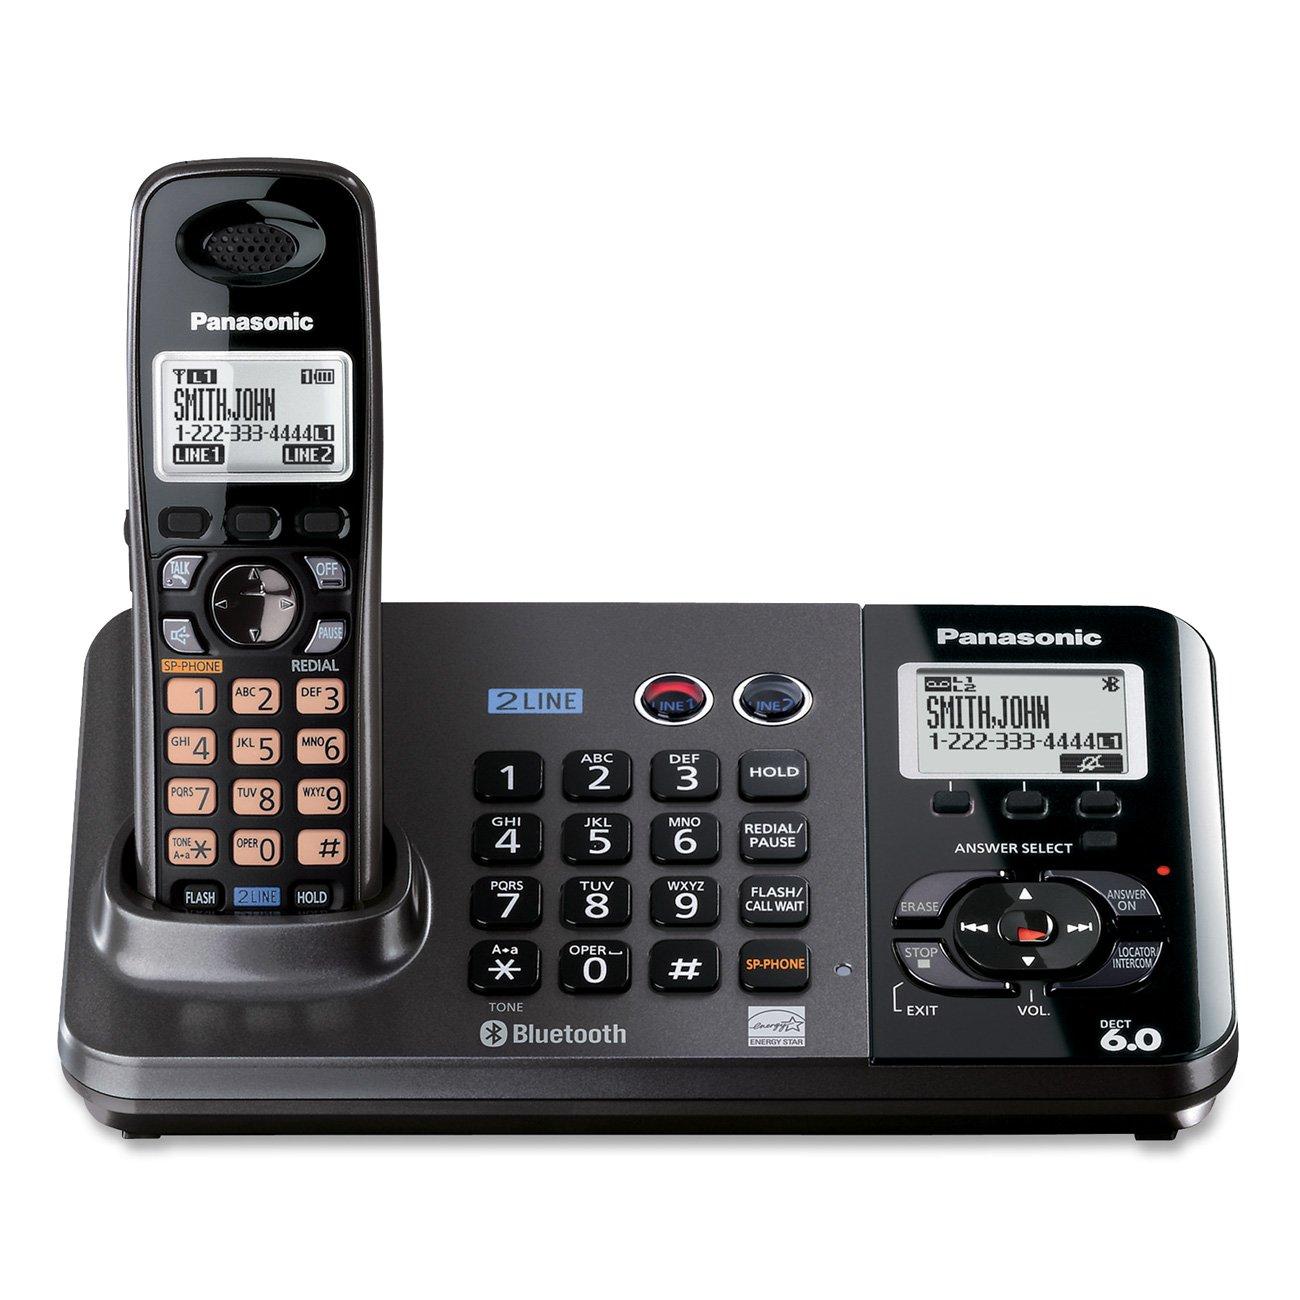 Panasonic Wireless Phone Wire Center Electronic Circuit Diagram Cxa1034pm Audio Amplifier Amazon Com Kx Tg9382t 2 Line Expandable Digital Cordless Rh